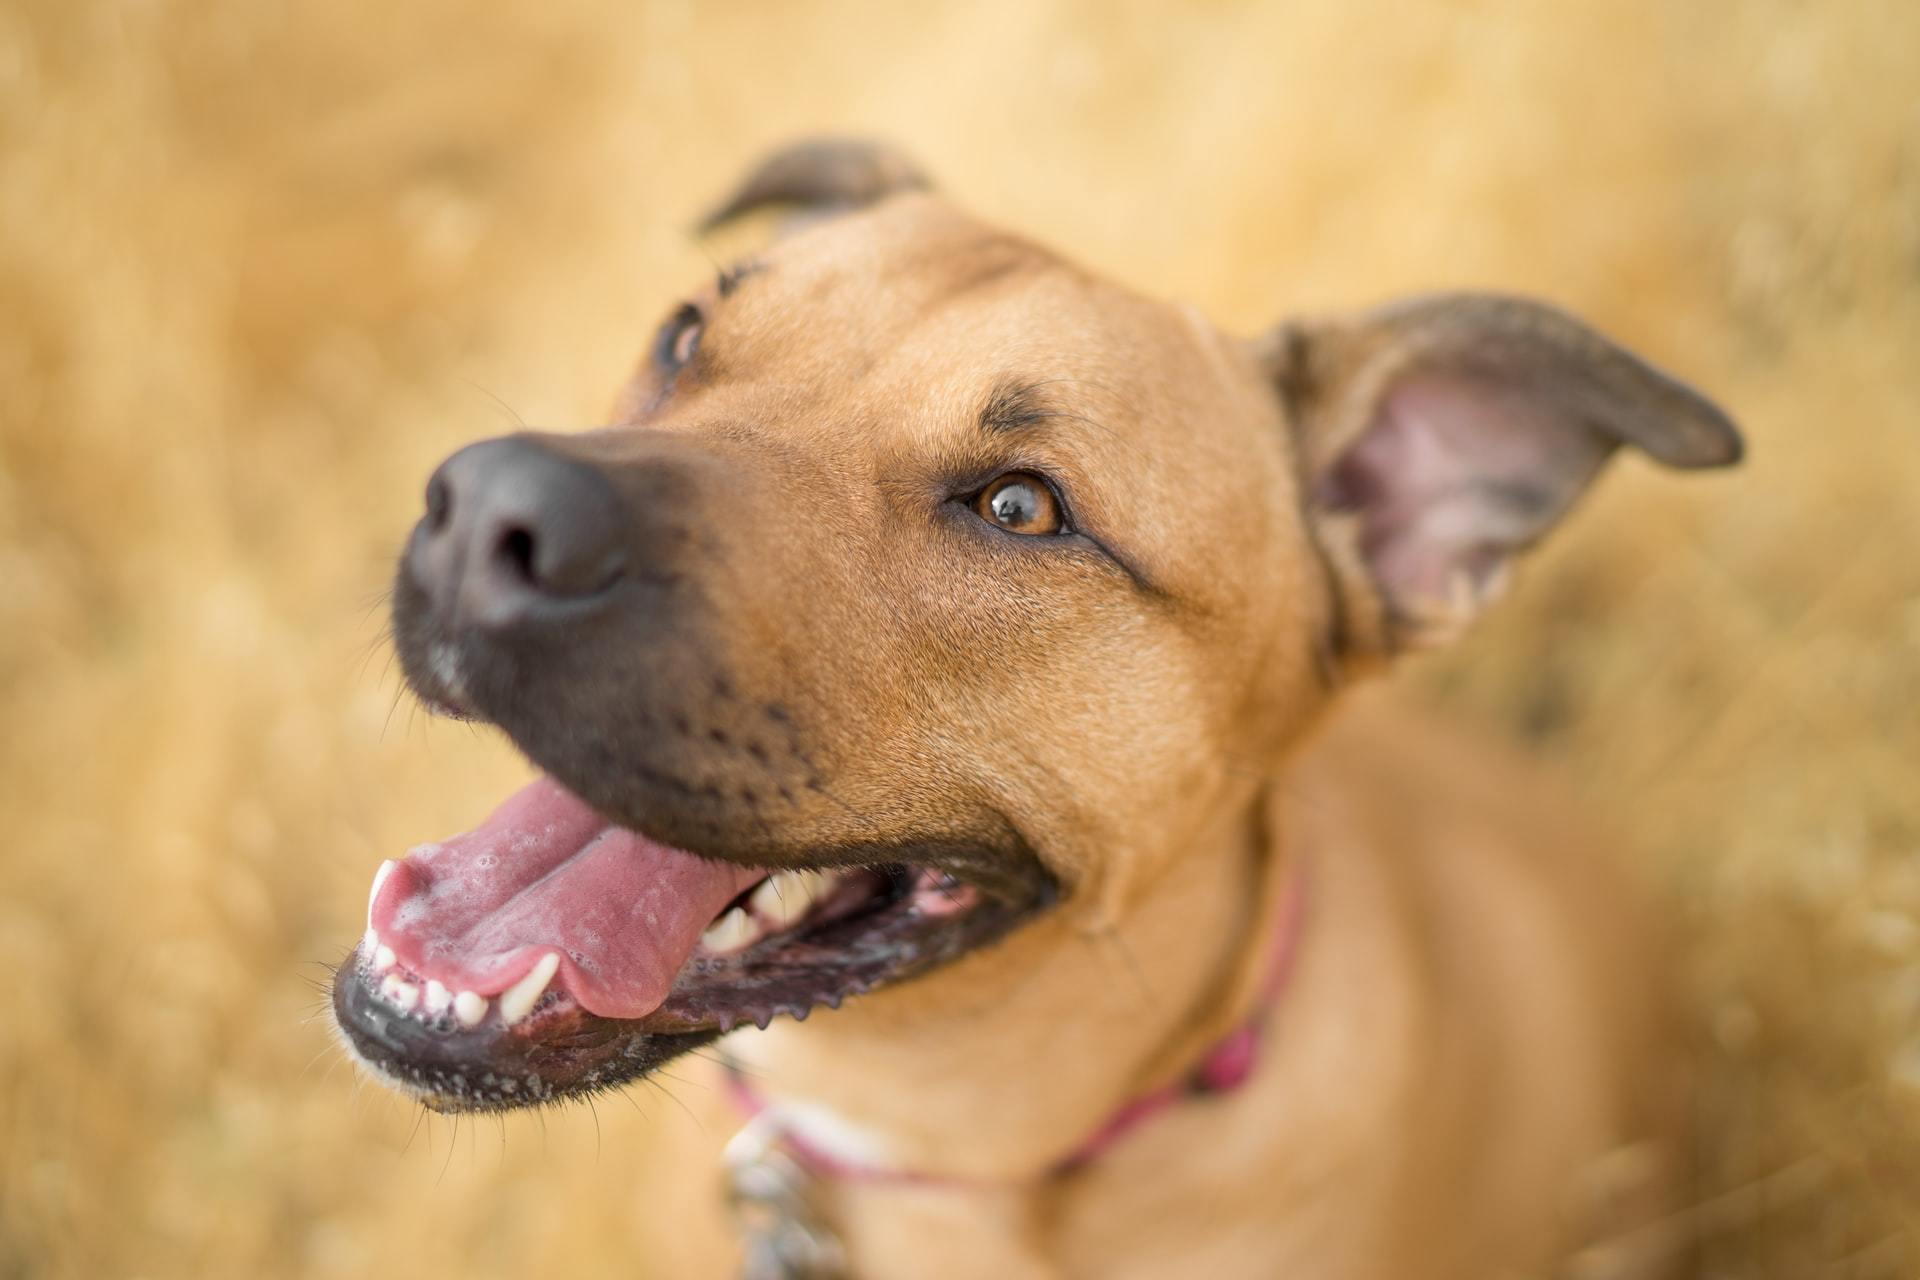 Dog ear infection treatment